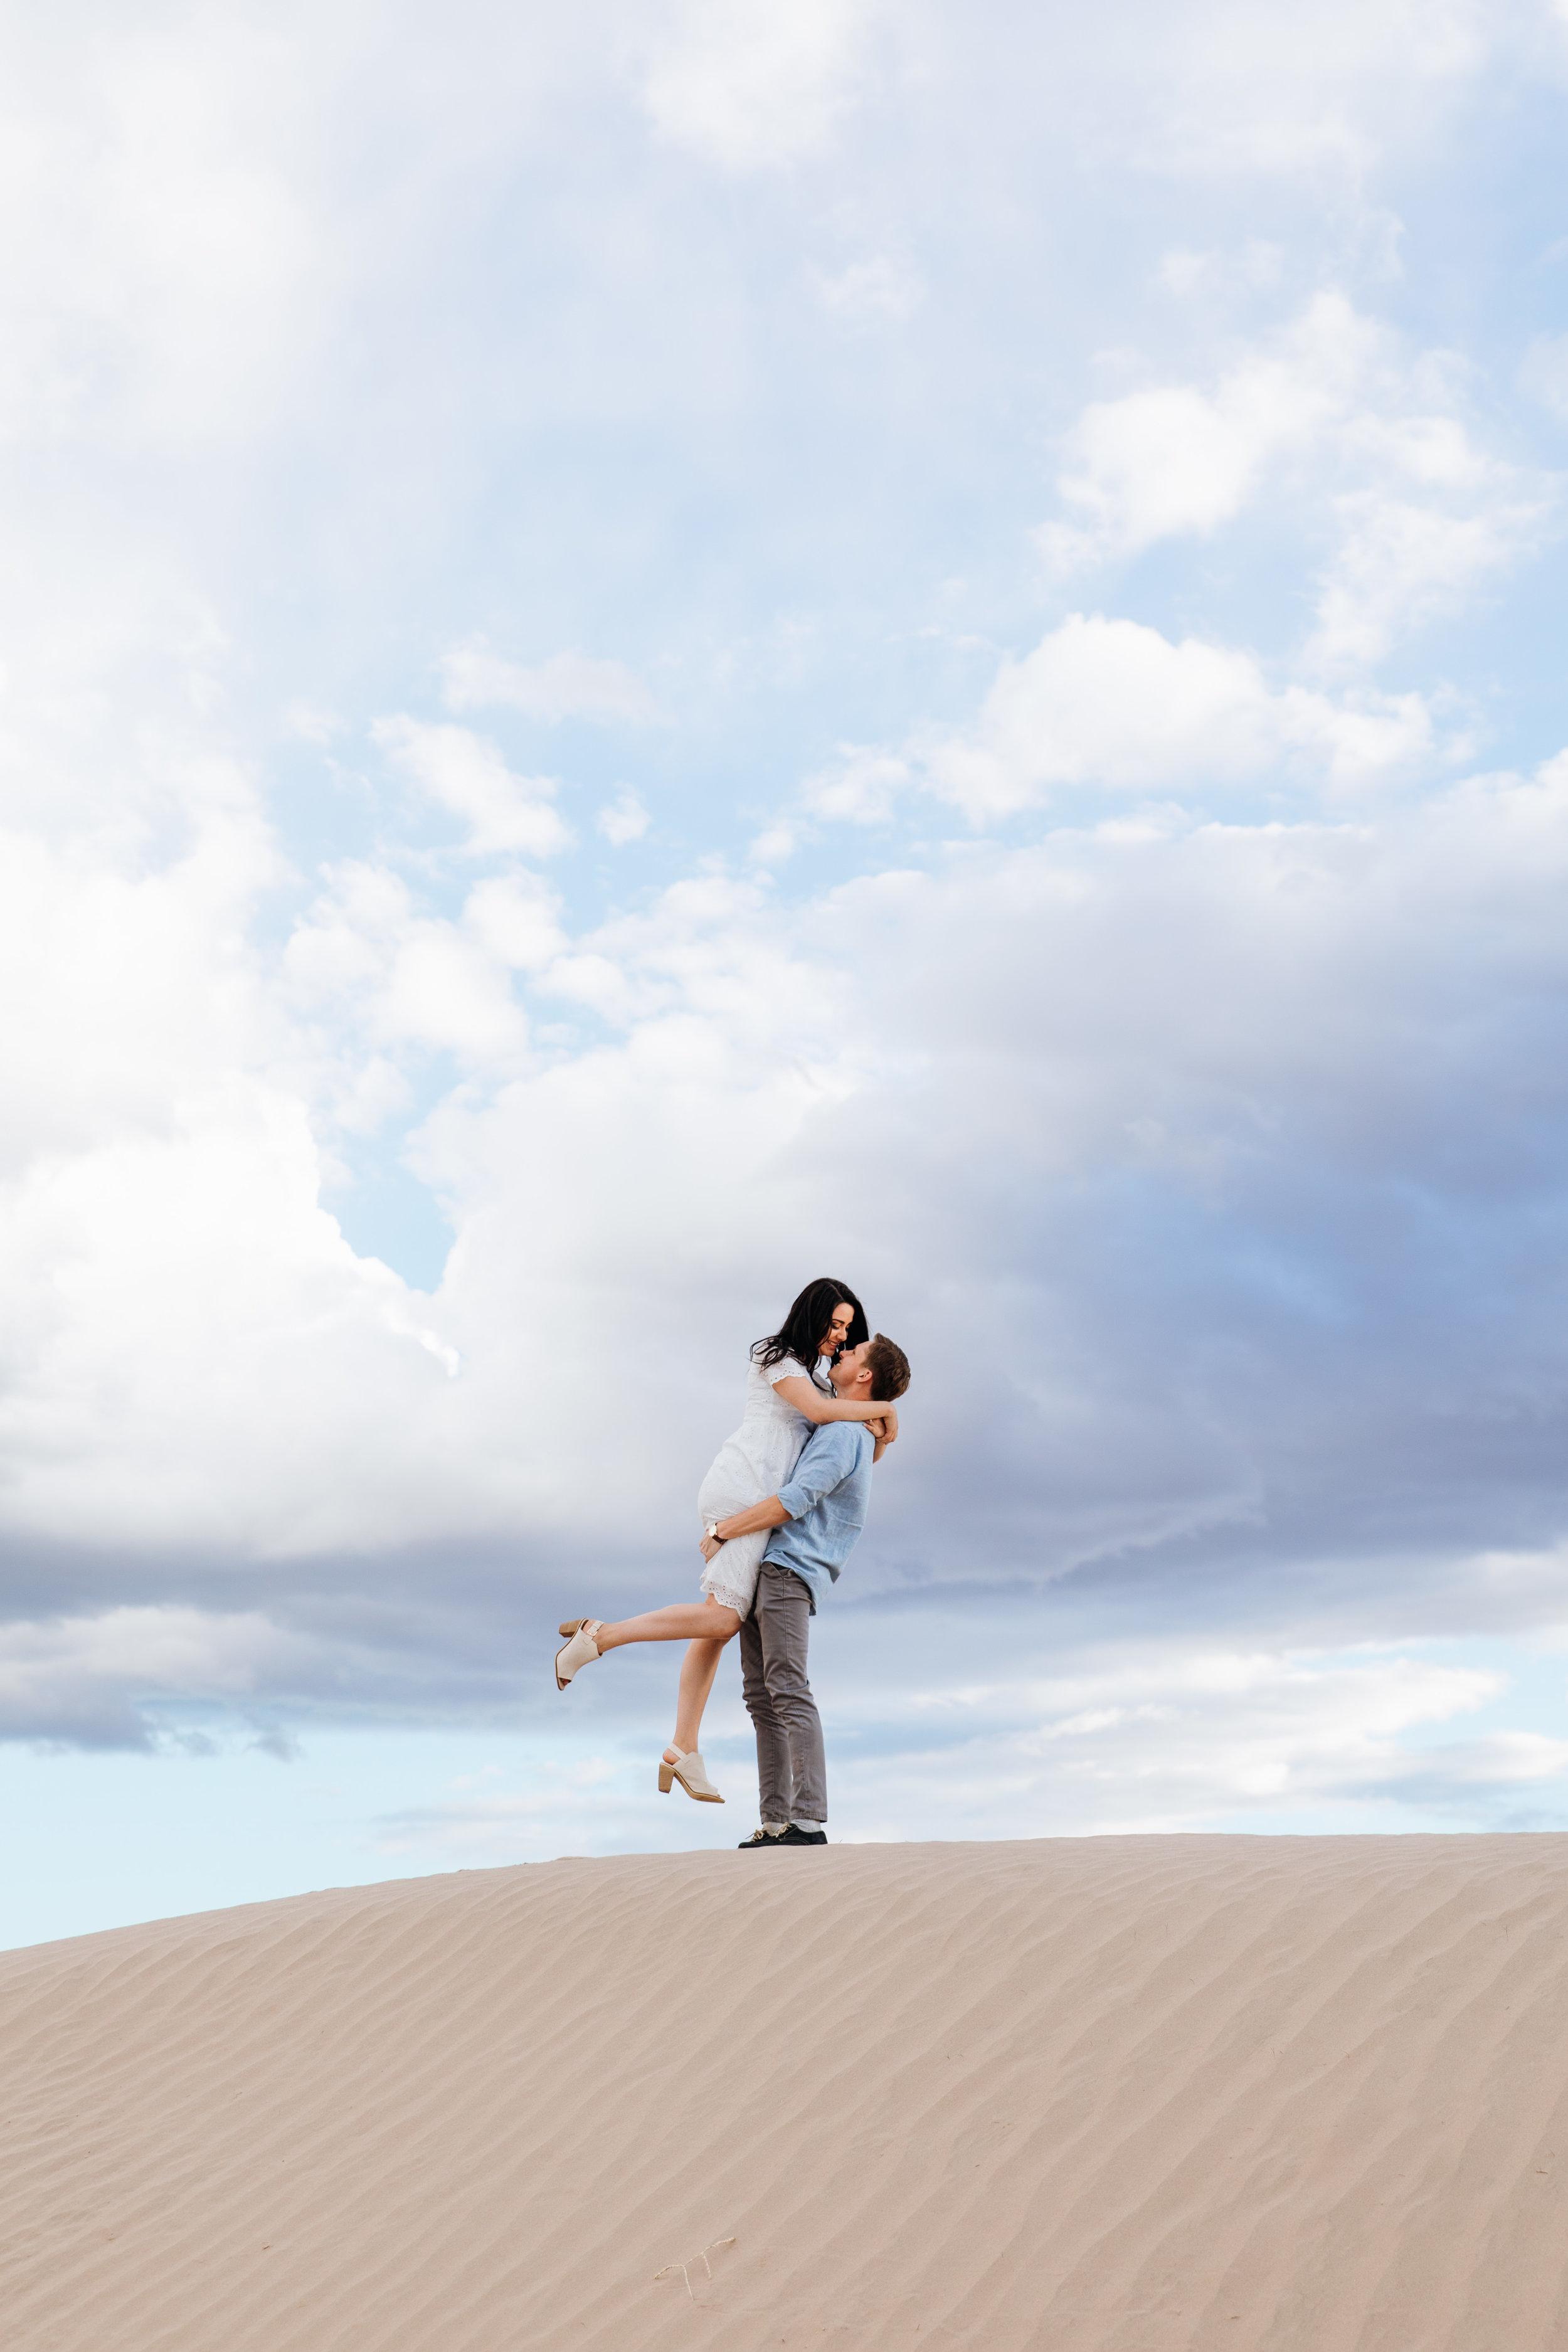 little-sahara-recreation-area-elopement-engagement-wedding-photography-michael-cozzens-44.jpg